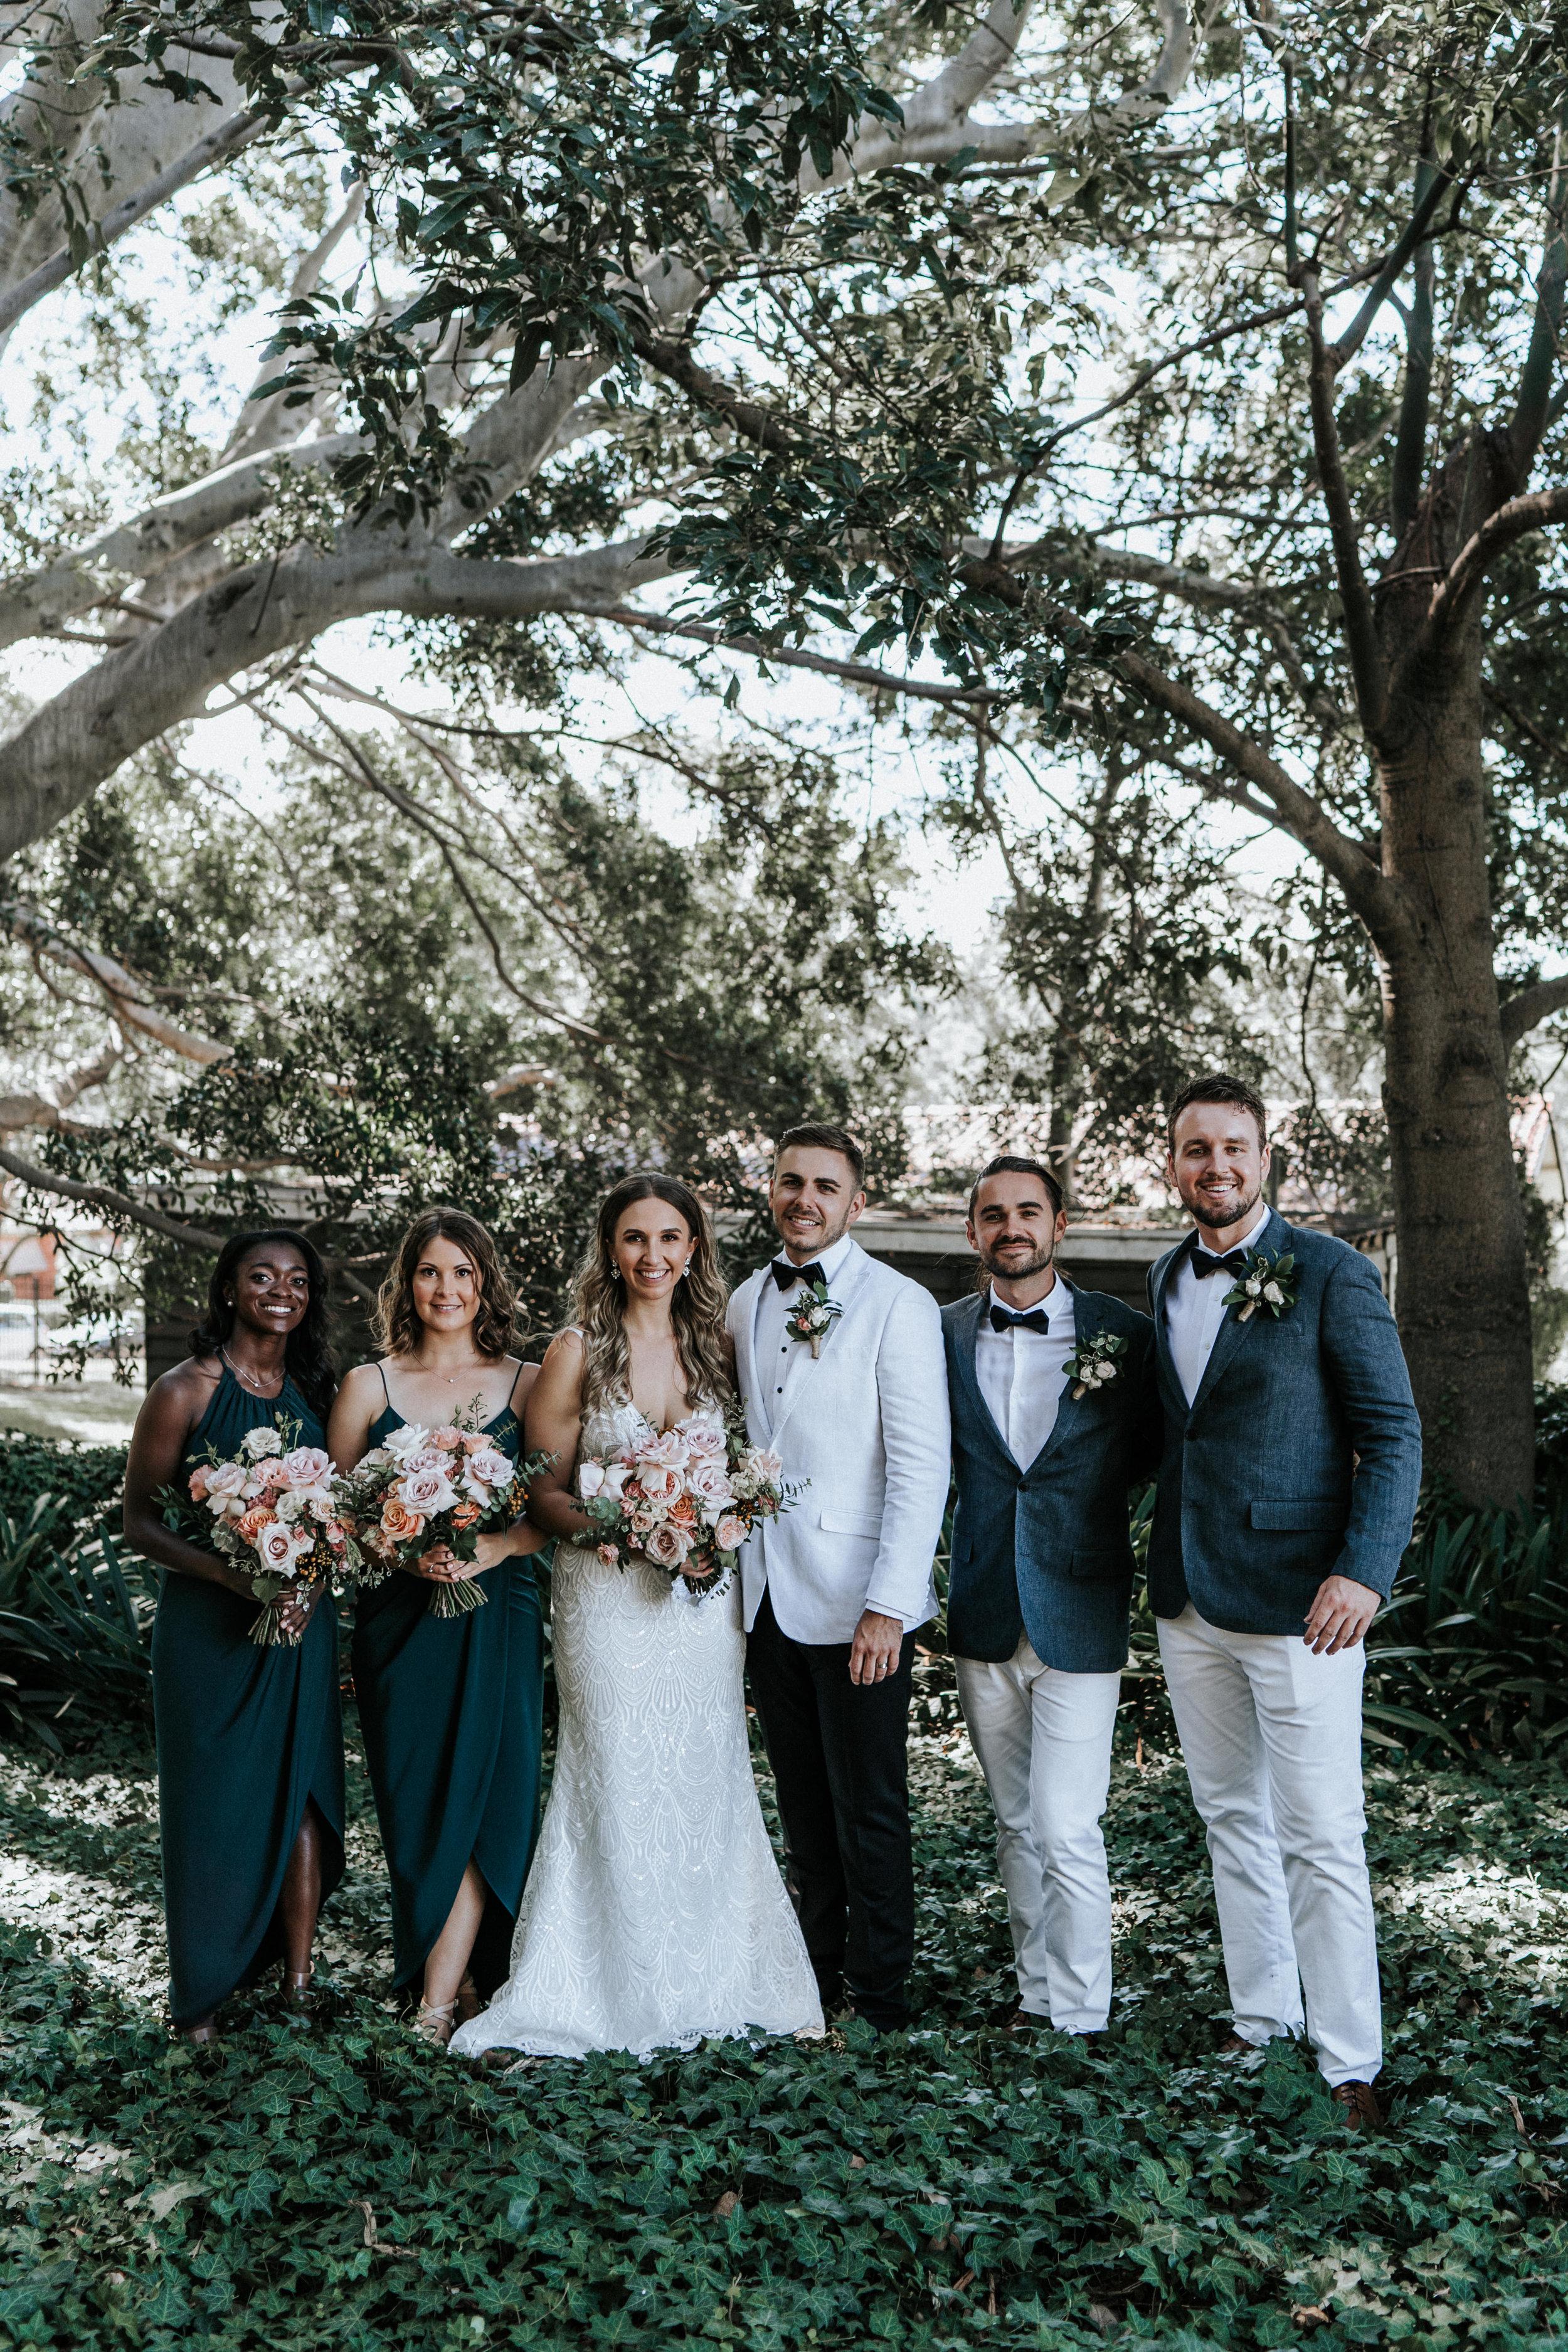 michelle-jonathon-harley-wedding-588.jpg